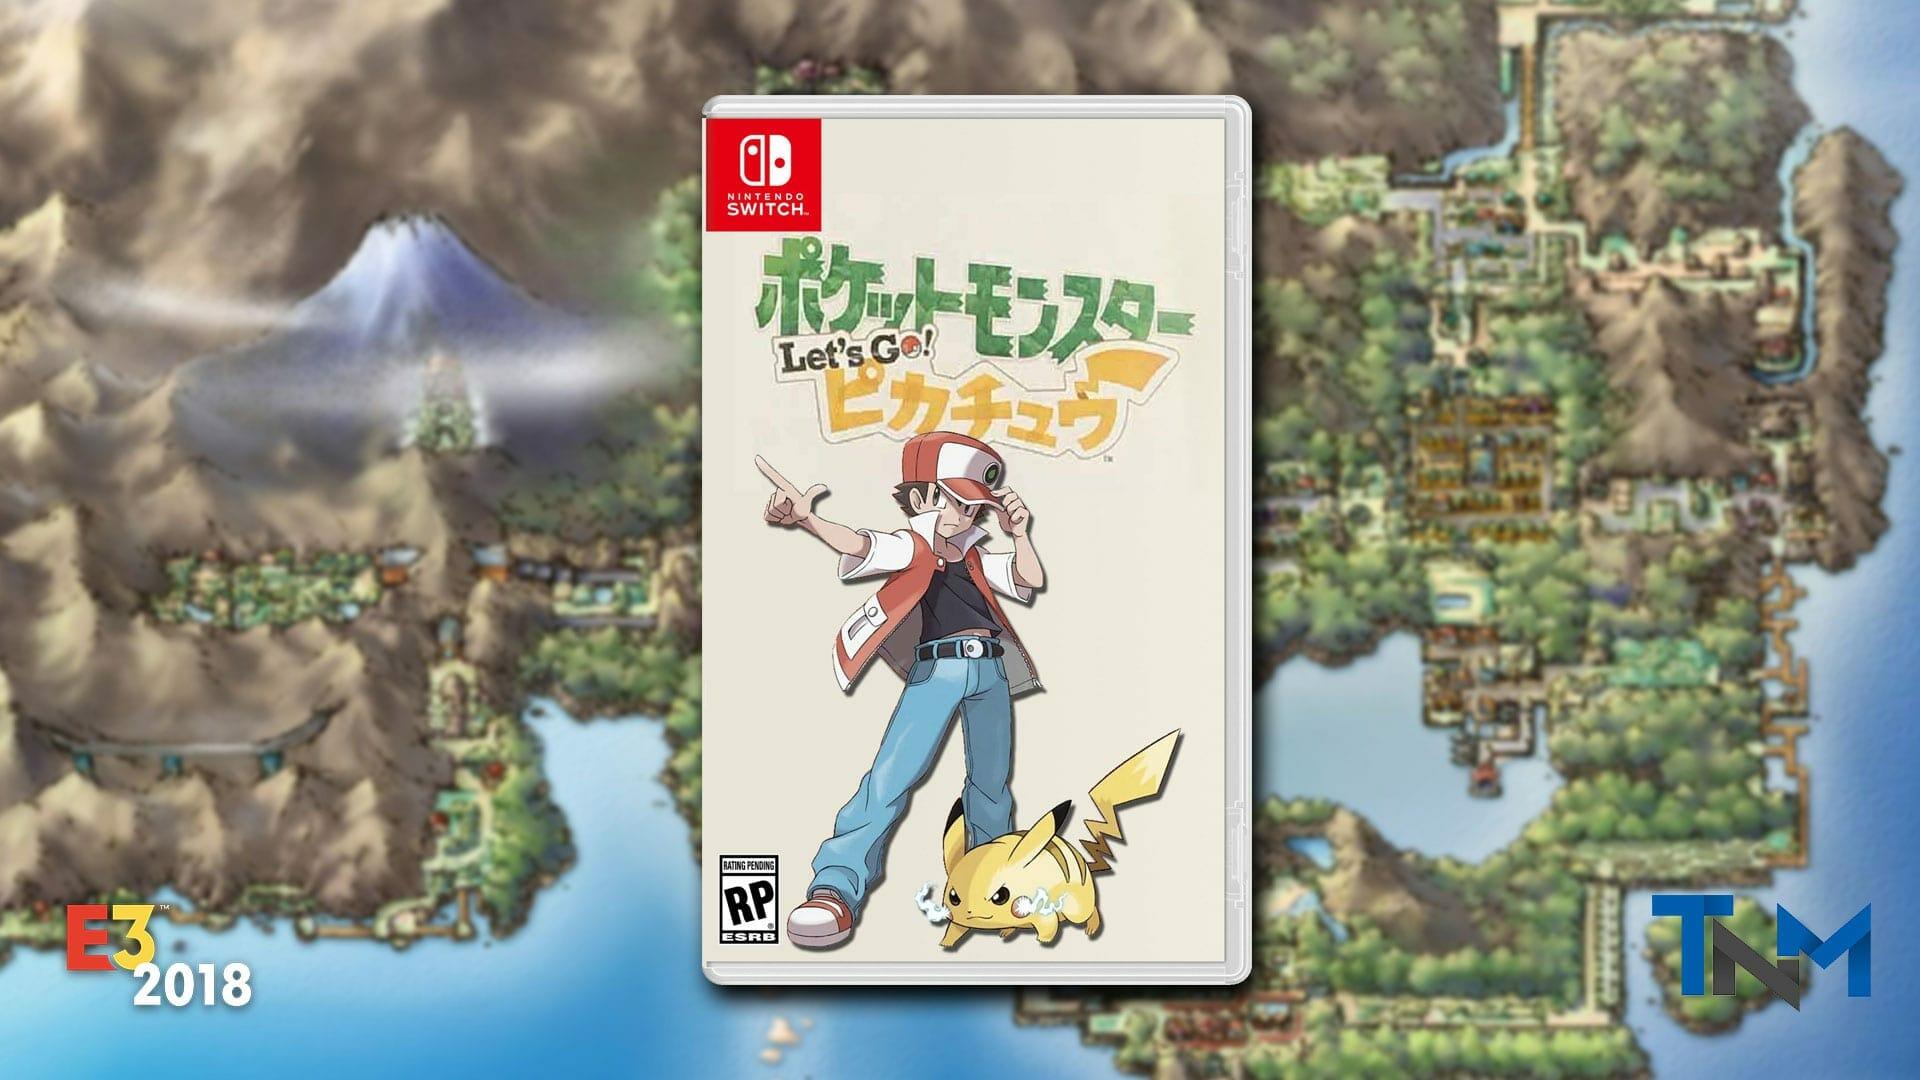 Let's Go Pikachu & Eevee E3 2018 Gameplay Trailer